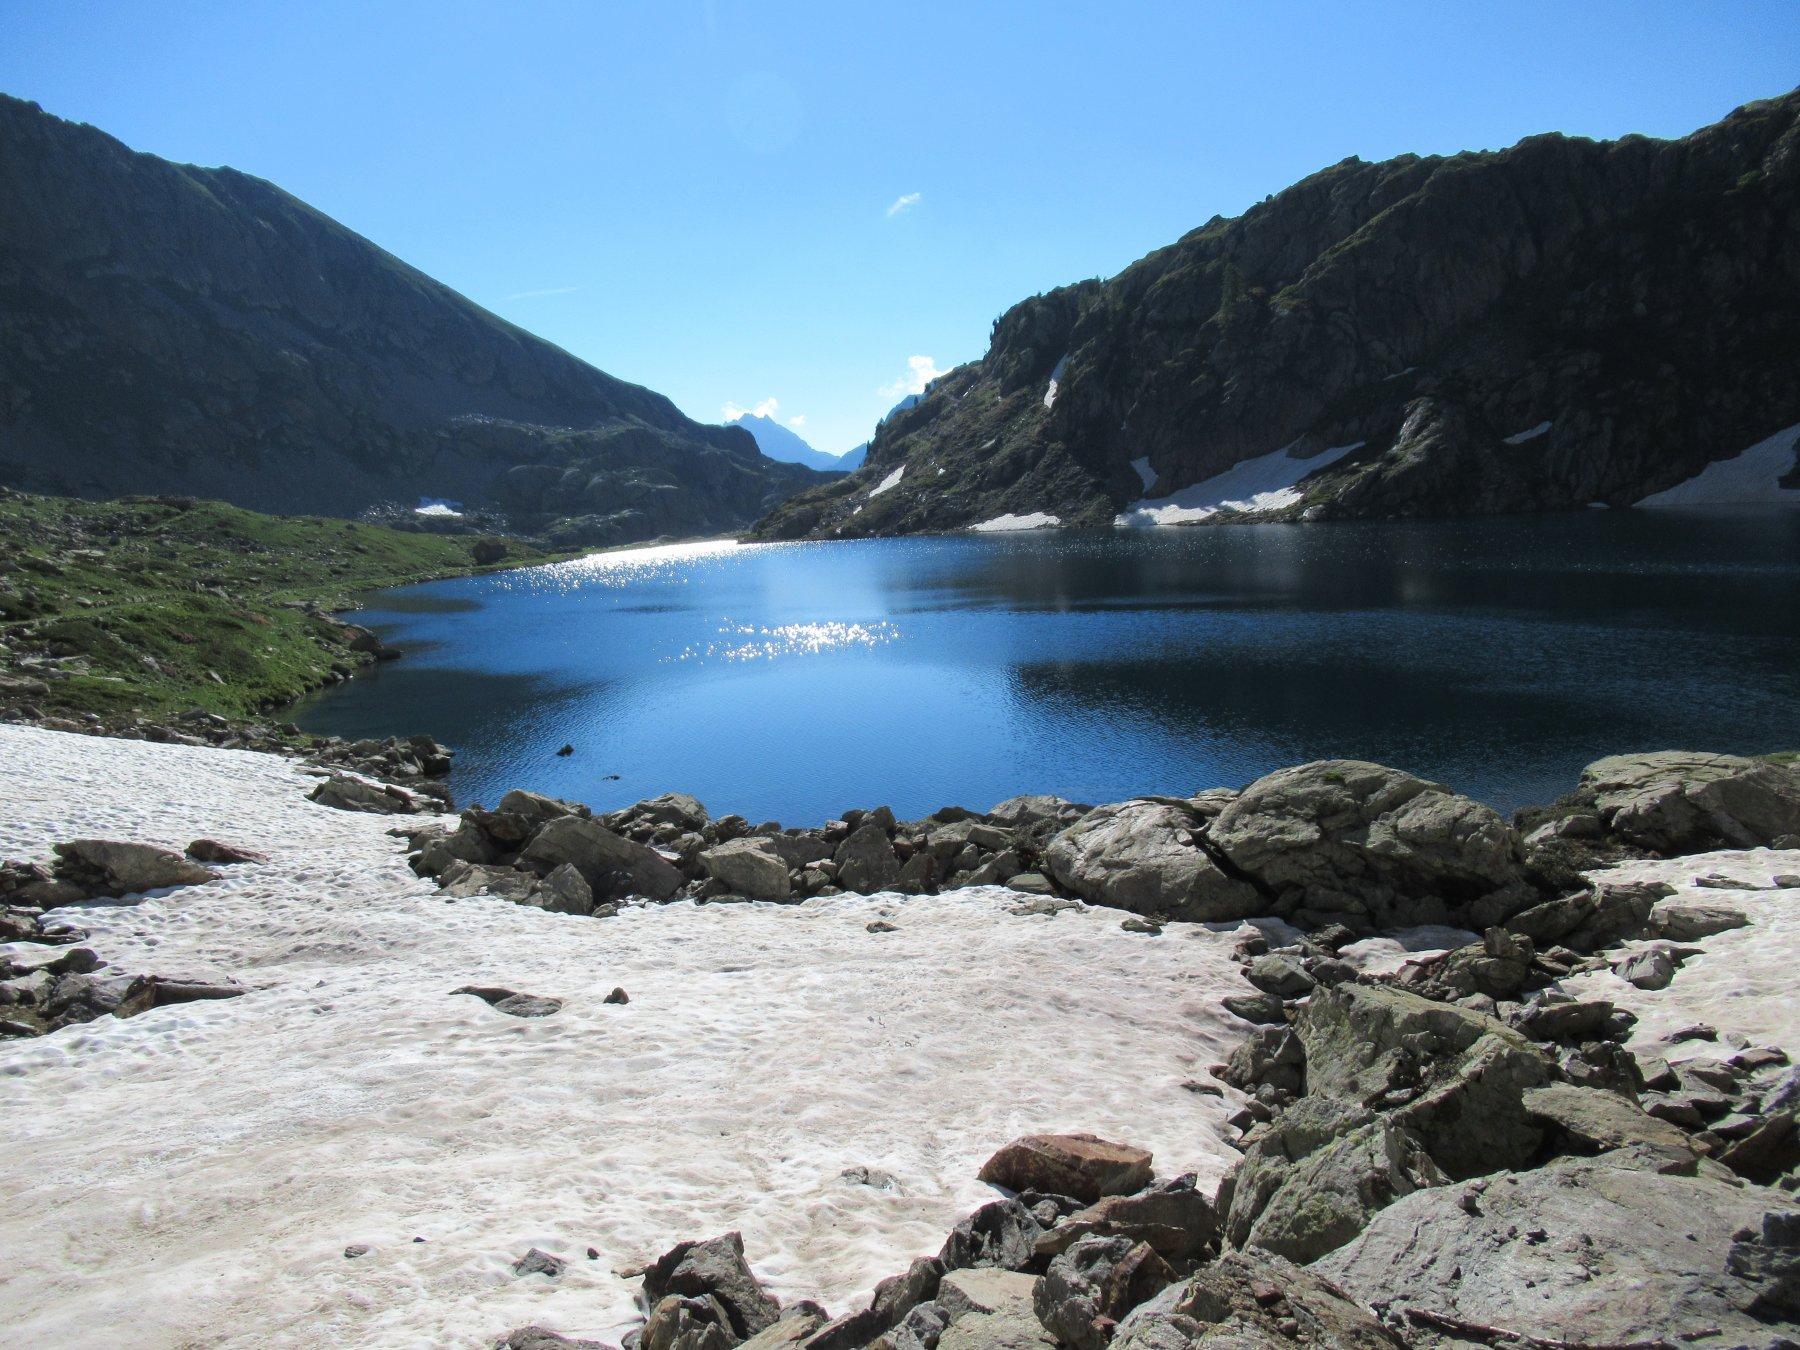 Lago inferiore di Vallescura (m.2274).